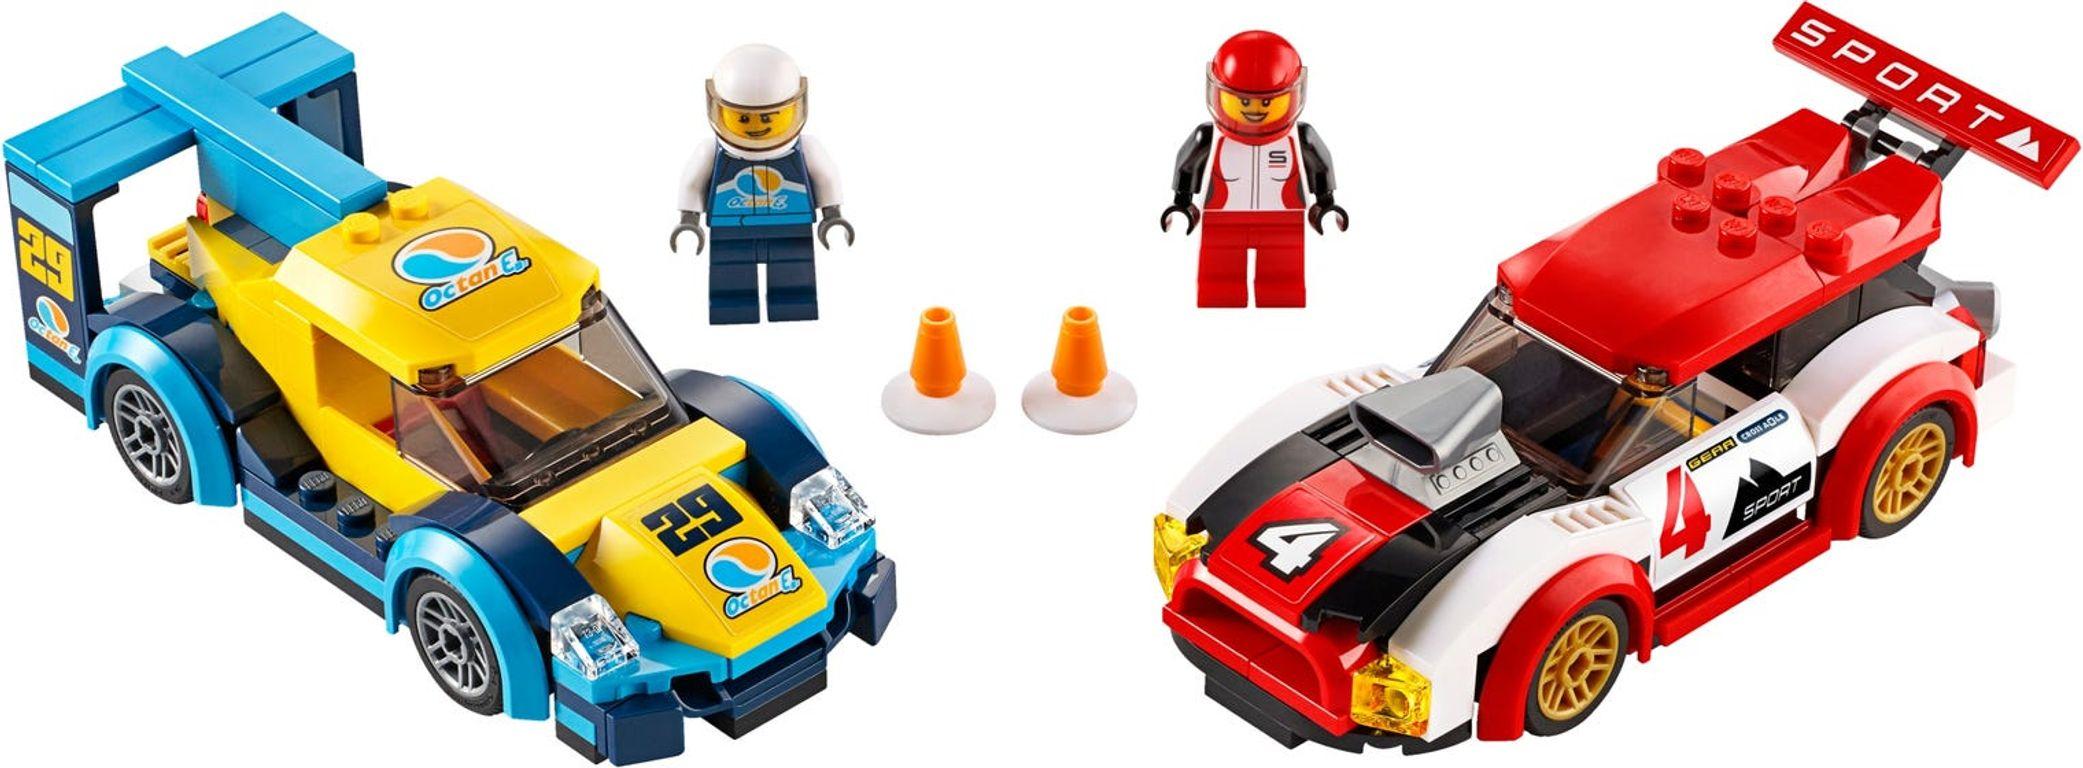 Racing Cars components